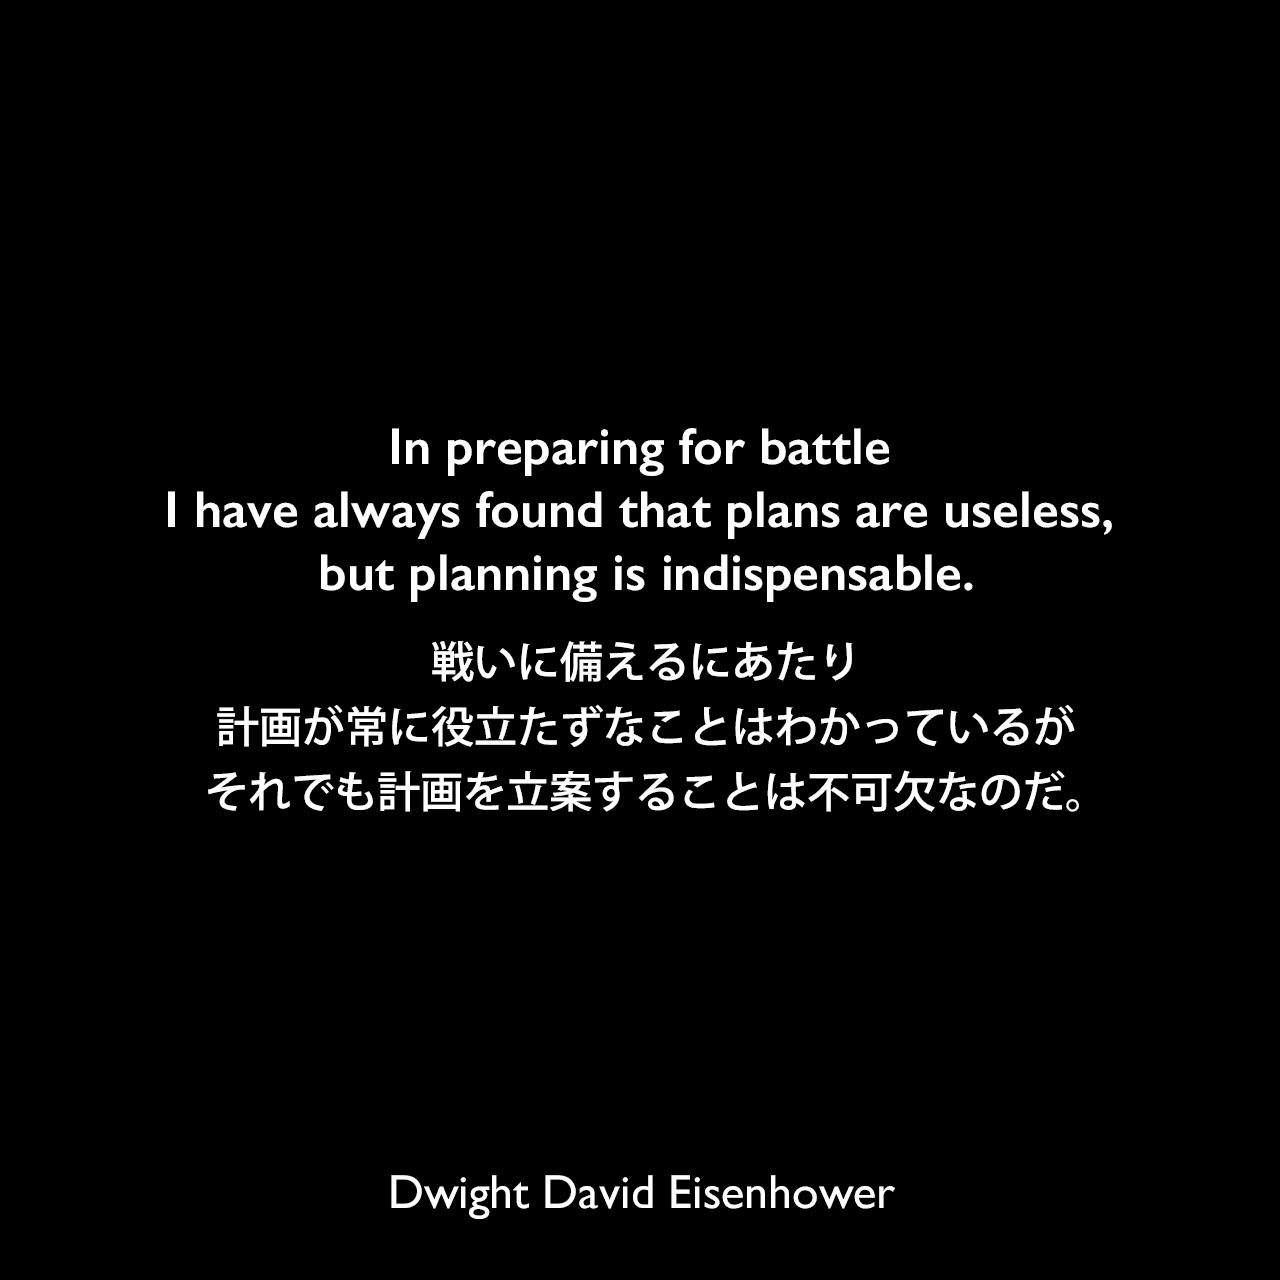 In preparing for battle I have always found that plans are useless, but planning is indispensable.戦いに備えるにあたり、計画が常に役立たずなことはわかっているが、それでも計画を立案することは不可欠なのだ。- リチャード・ニクソンによる本「Six Crises」よりDwight David Eisenhower